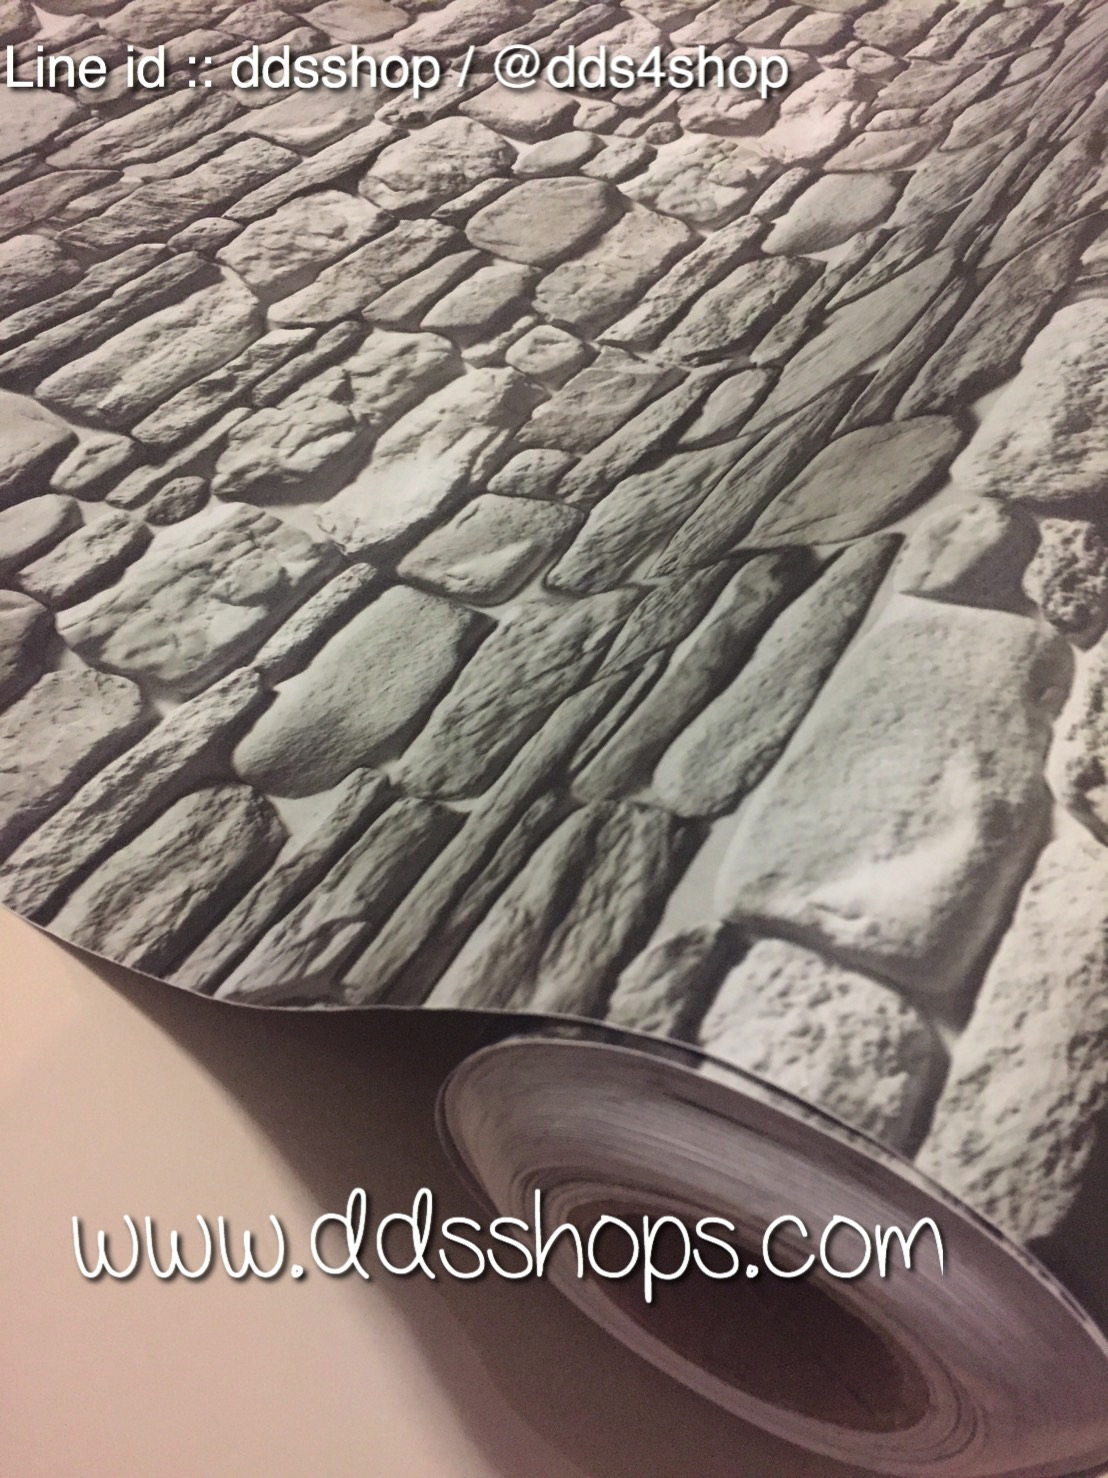 "Wallpaper Sticker วอลล์เปเปอร์แบบมีกาวในตัว ""ลายหินสีเทาดำ"" หน้ากว้าง 1.22m ตัดขายตามความยาว เมตรละ 250 บาท"